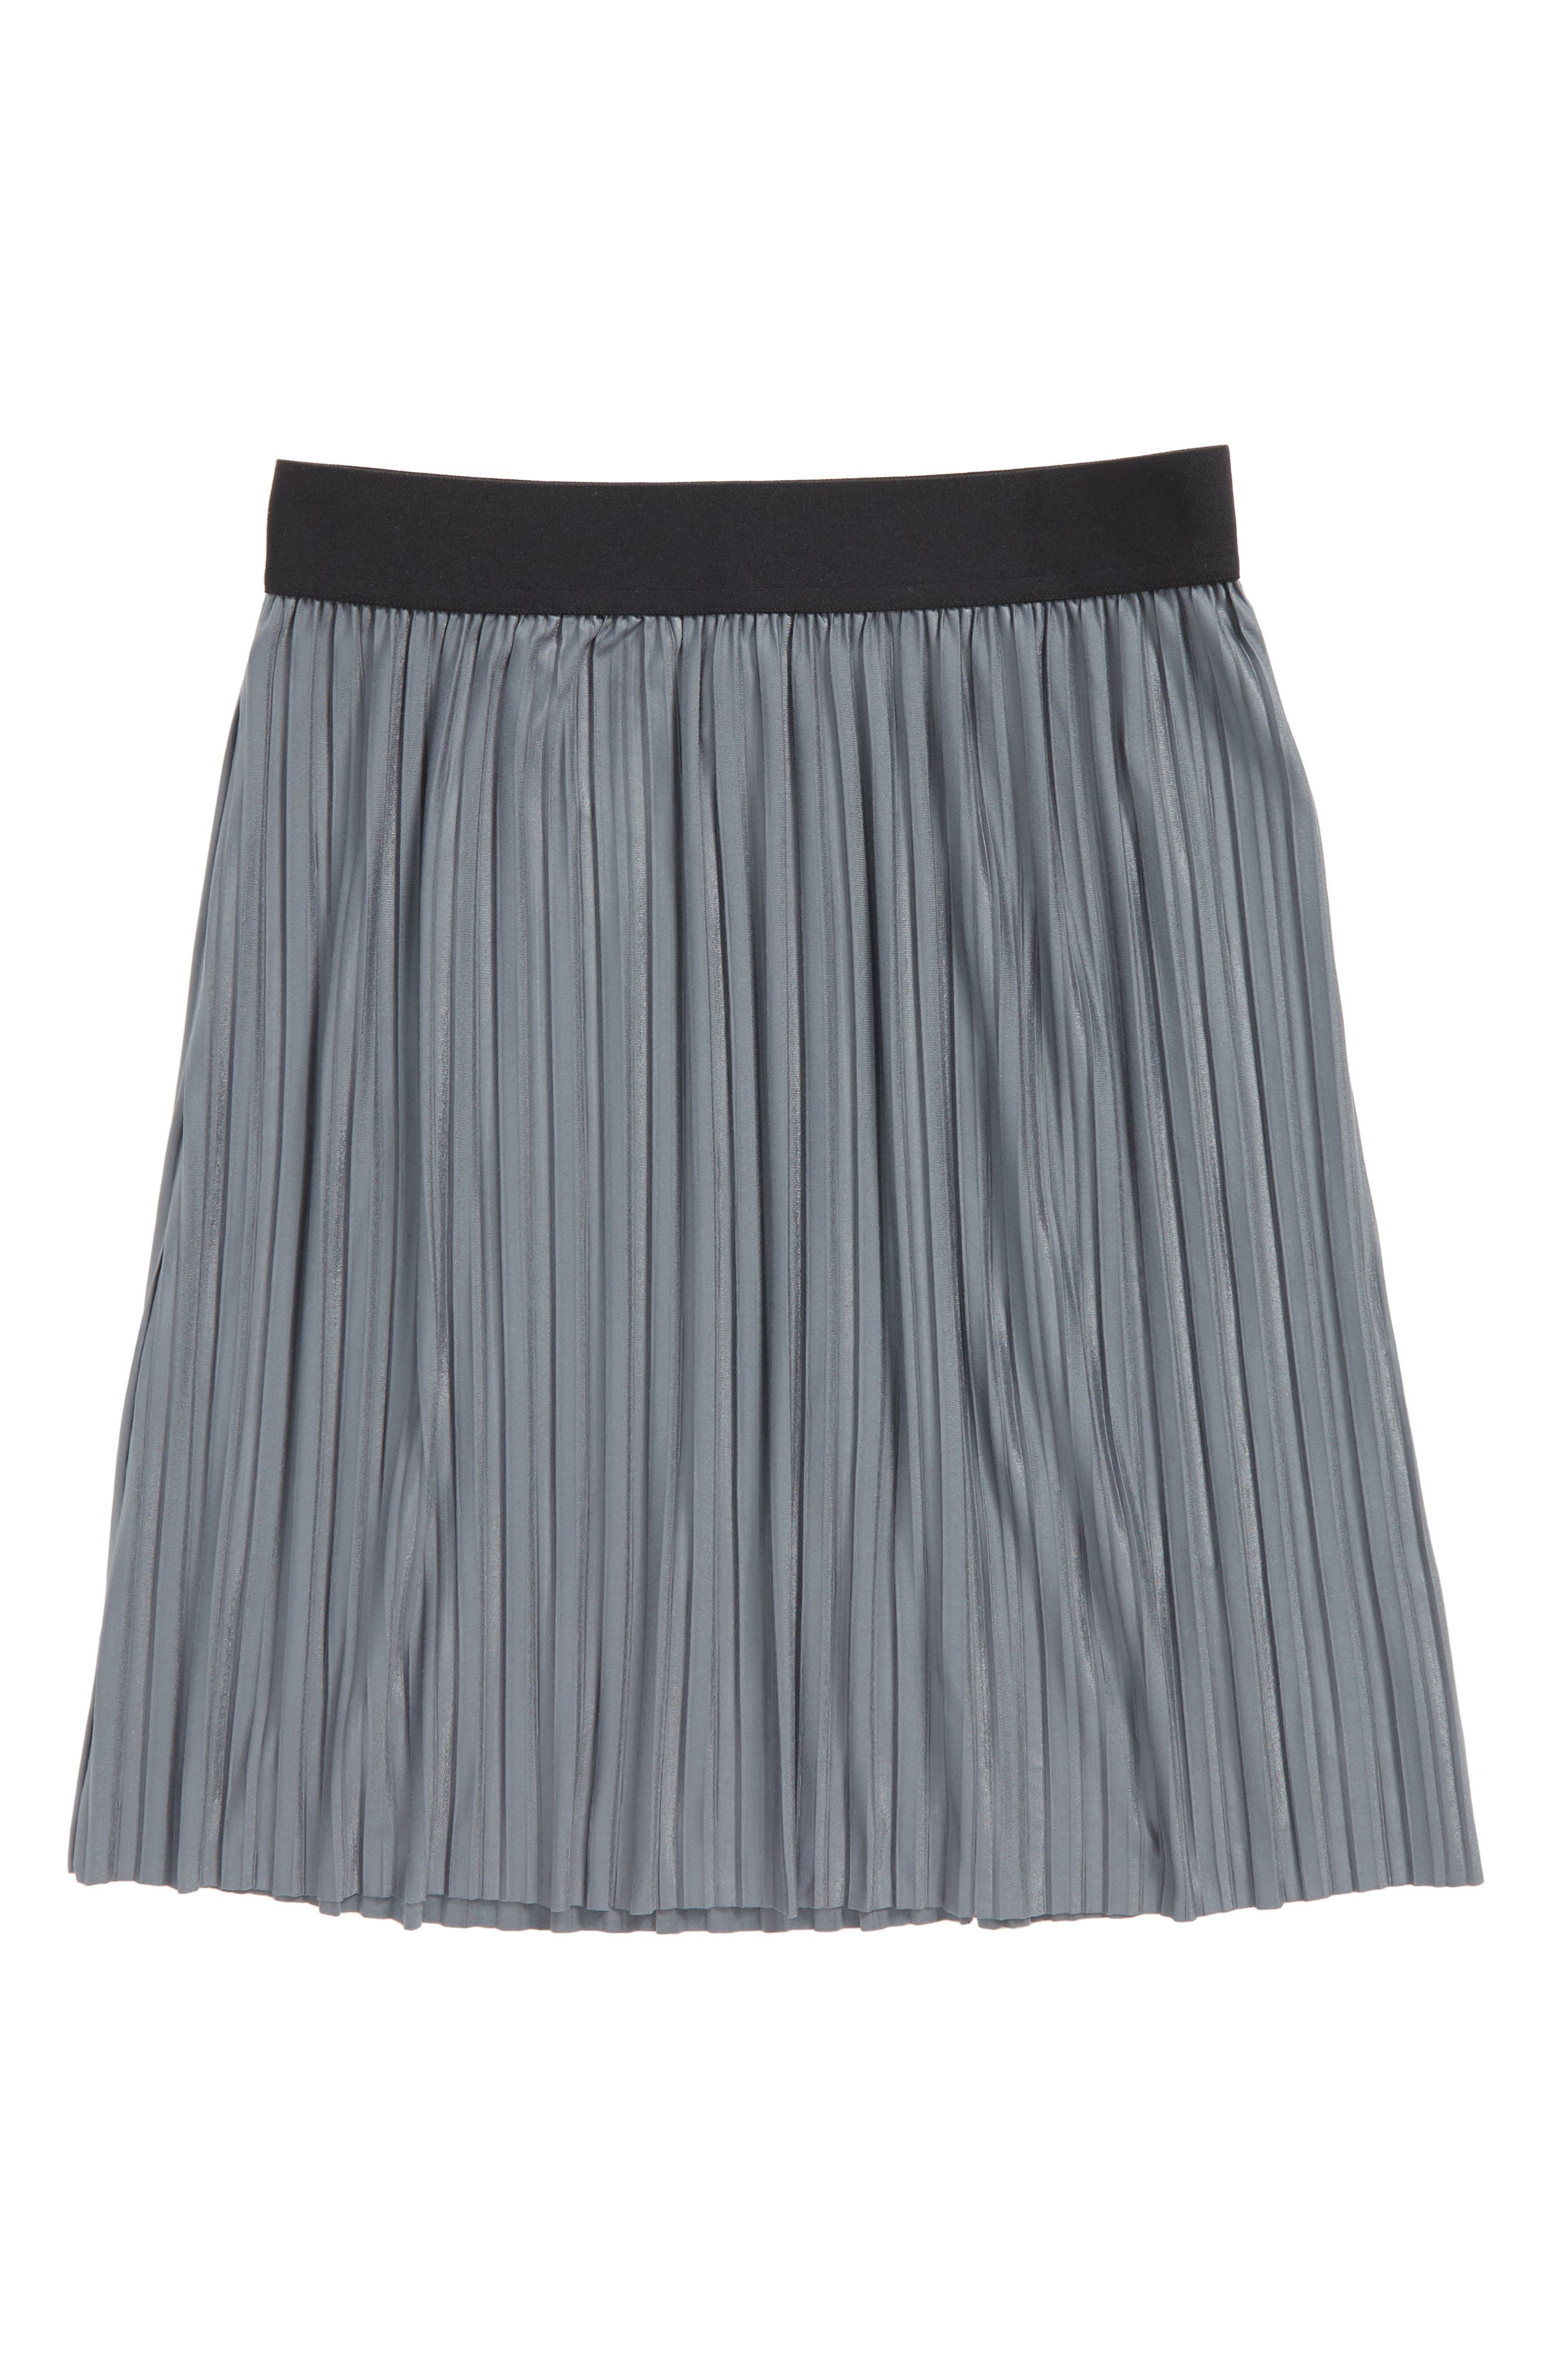 Pleated Skirt,                         Main,                         color, Grey Castlerock